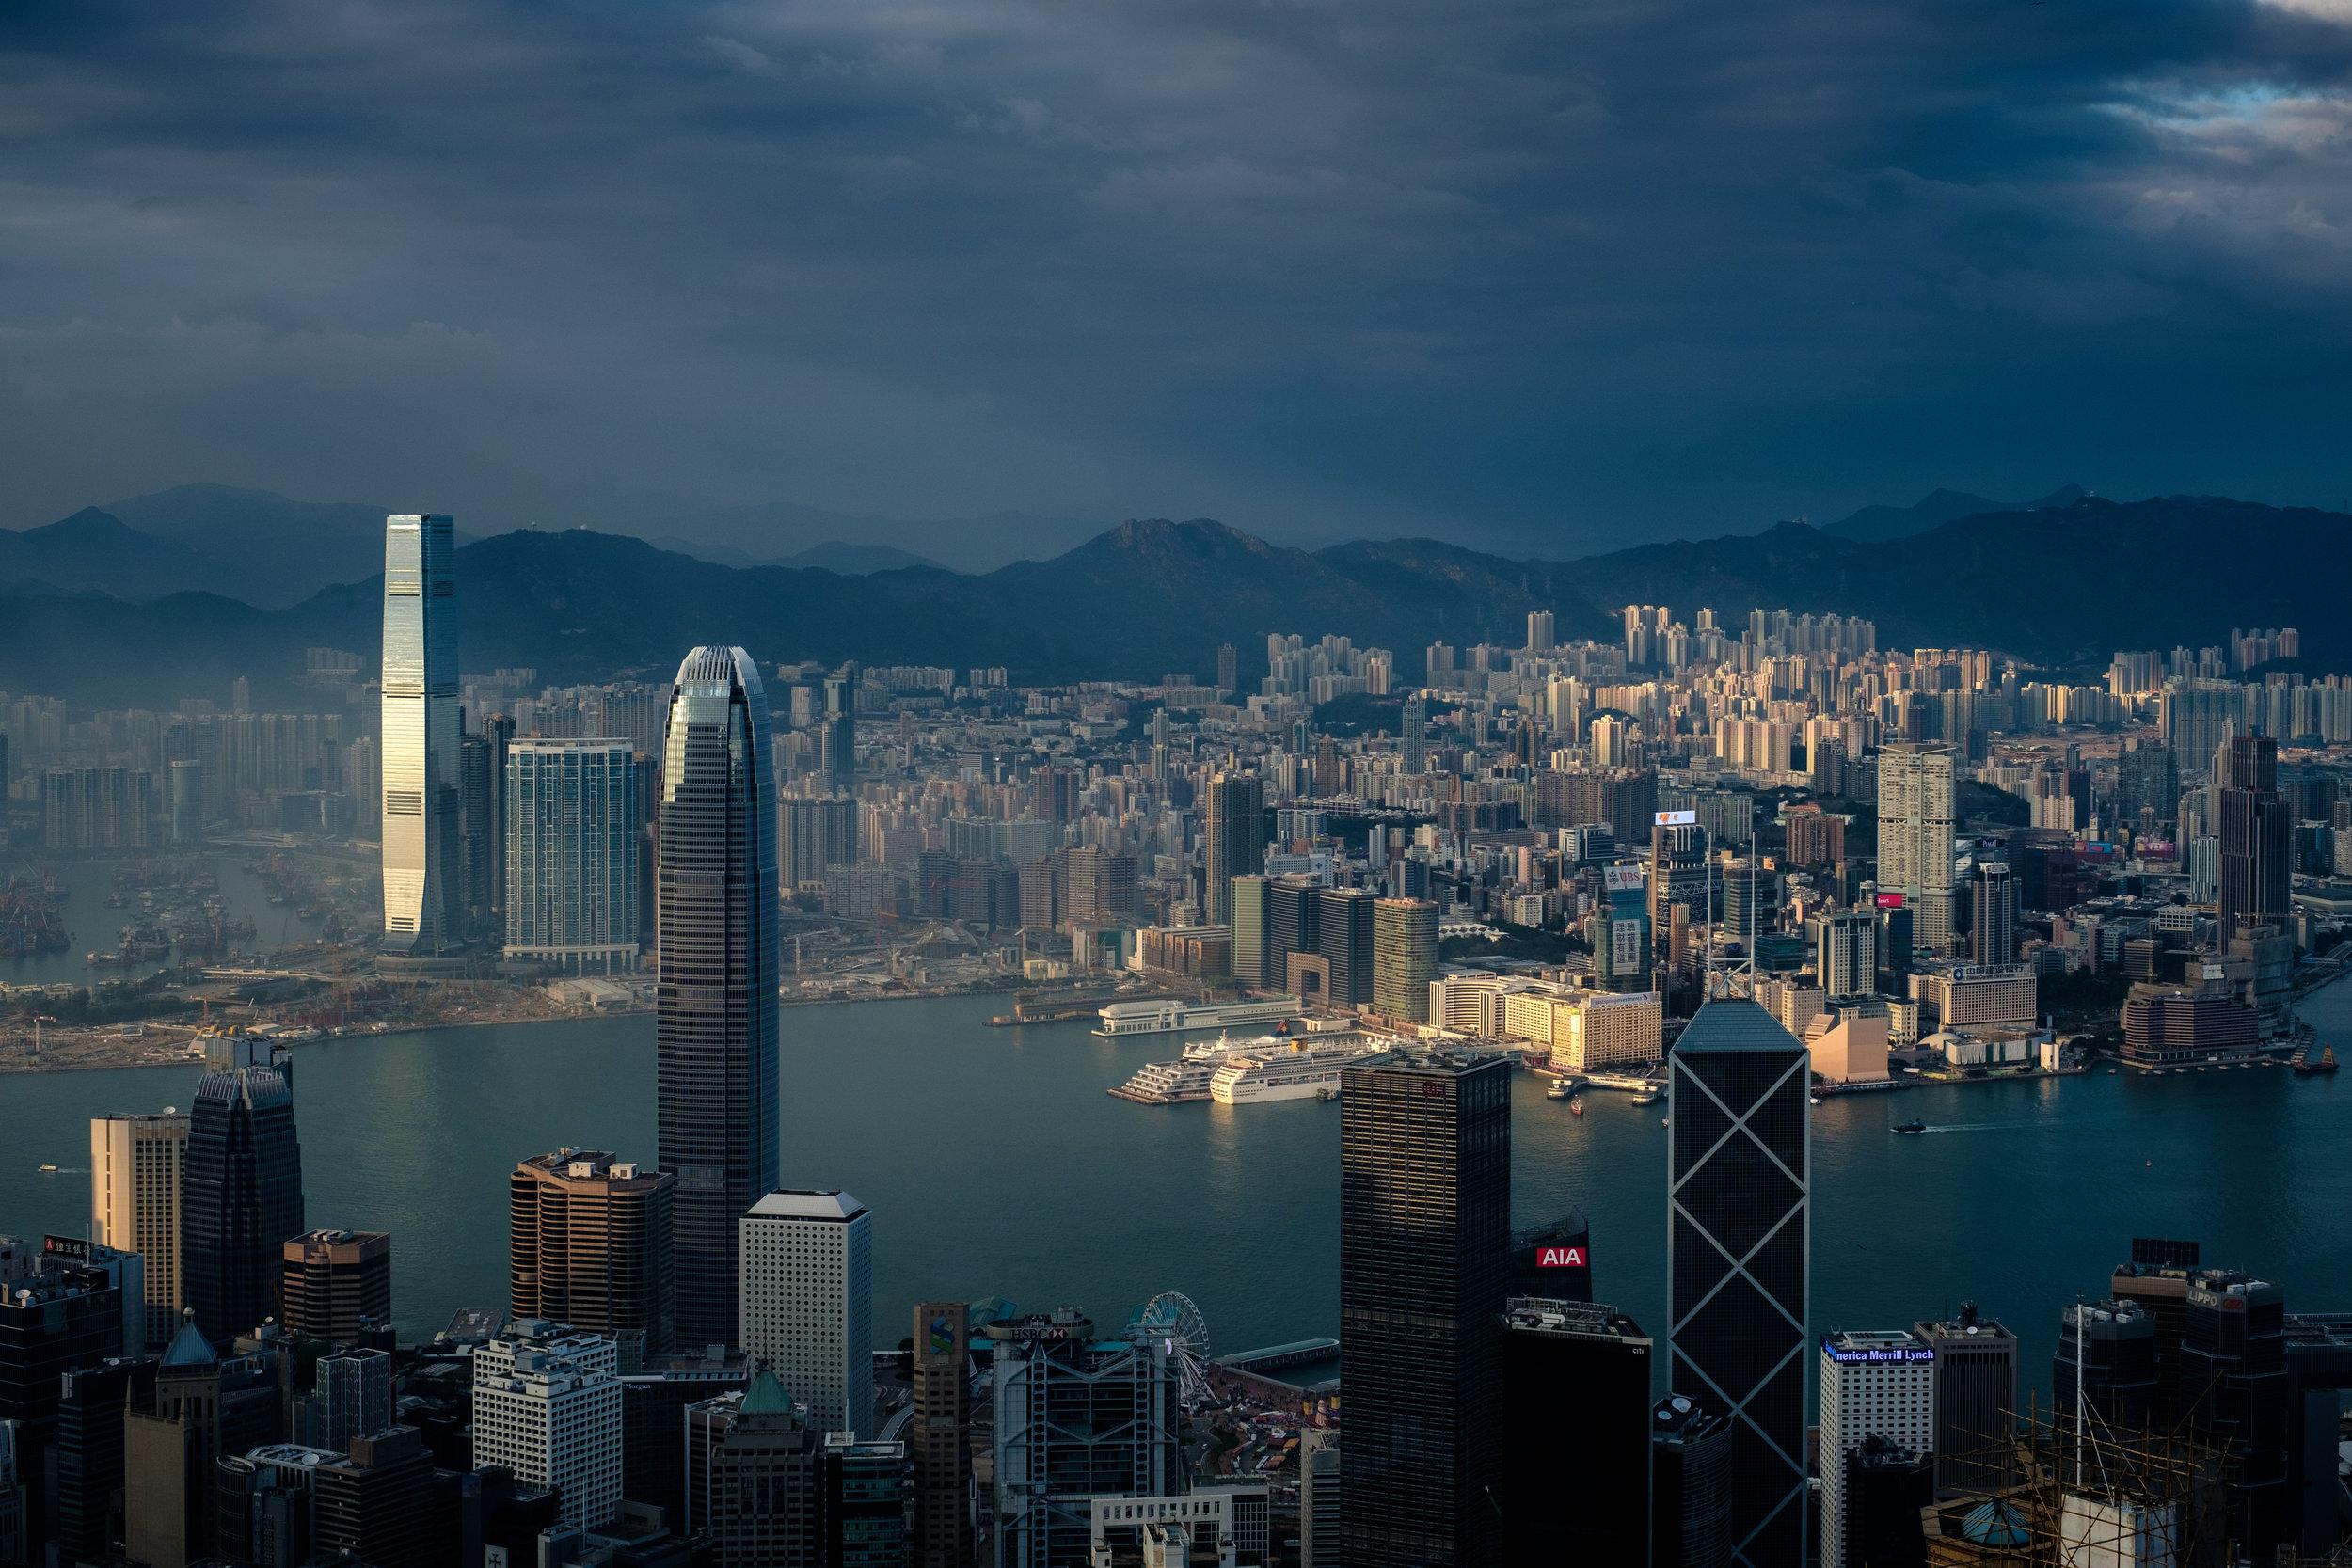 Hong Kong , X-Pro2, XF 35mm f/1.4 R @ f/5.6